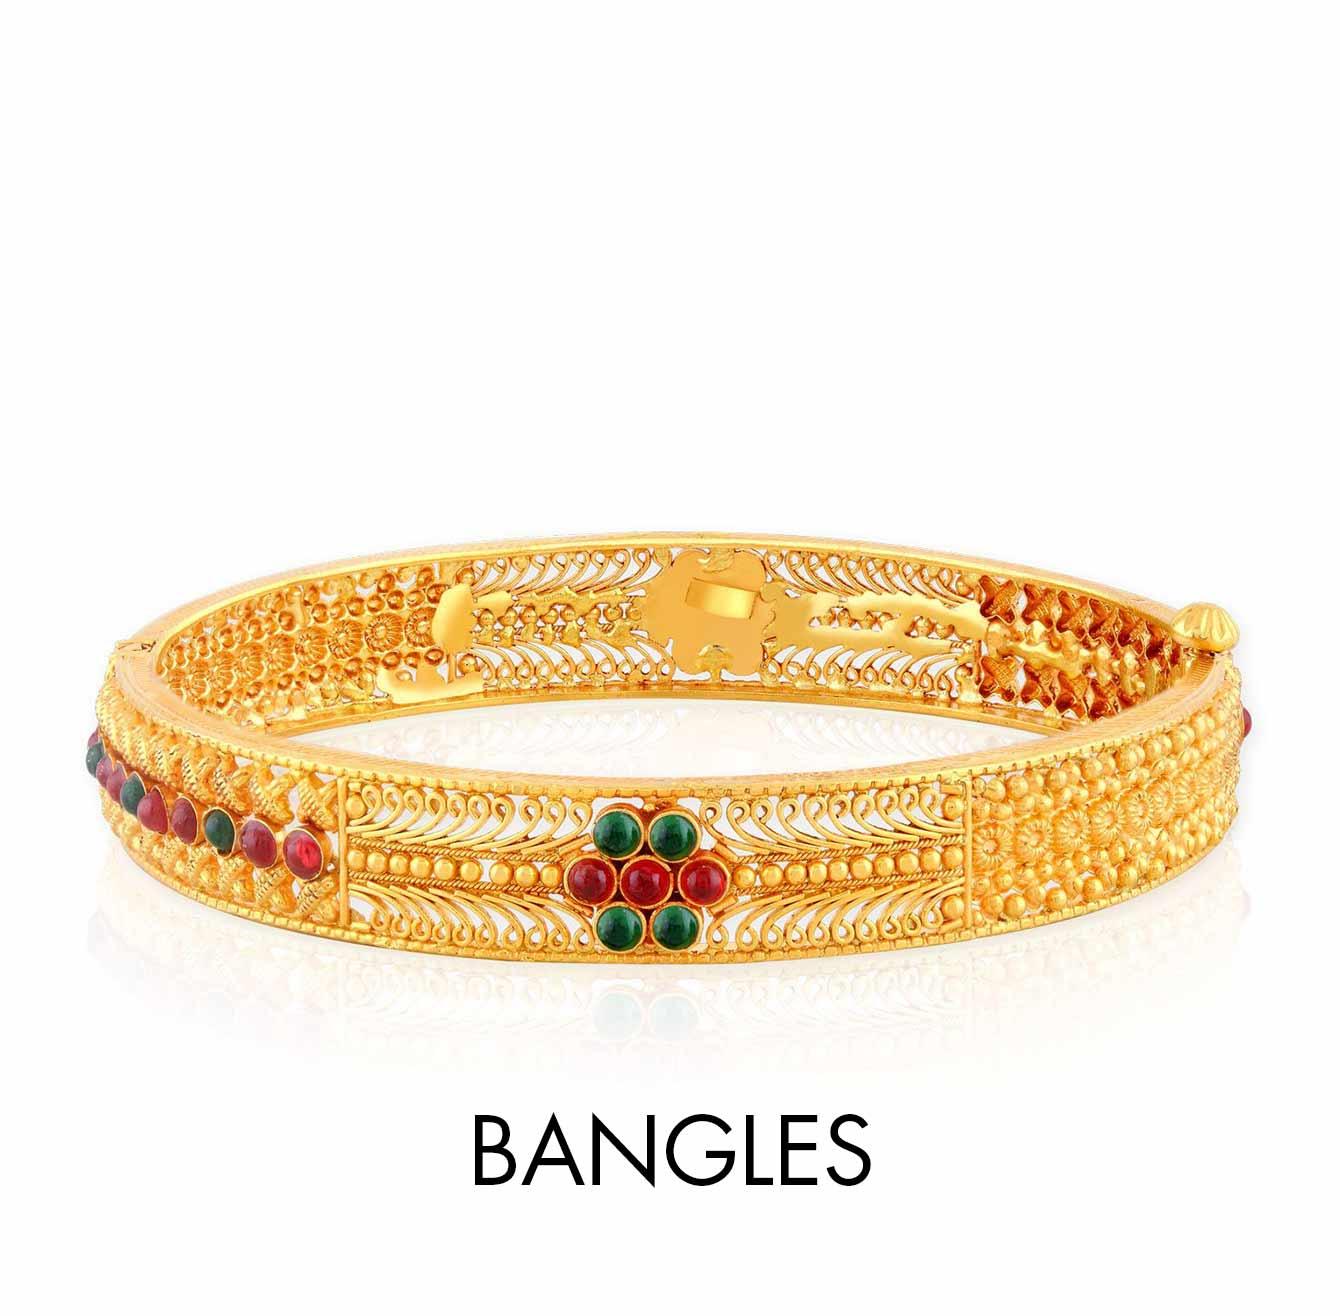 Bangles With Price: Amazon.in: Malabar Gold & Diamonds Store: Jewellery